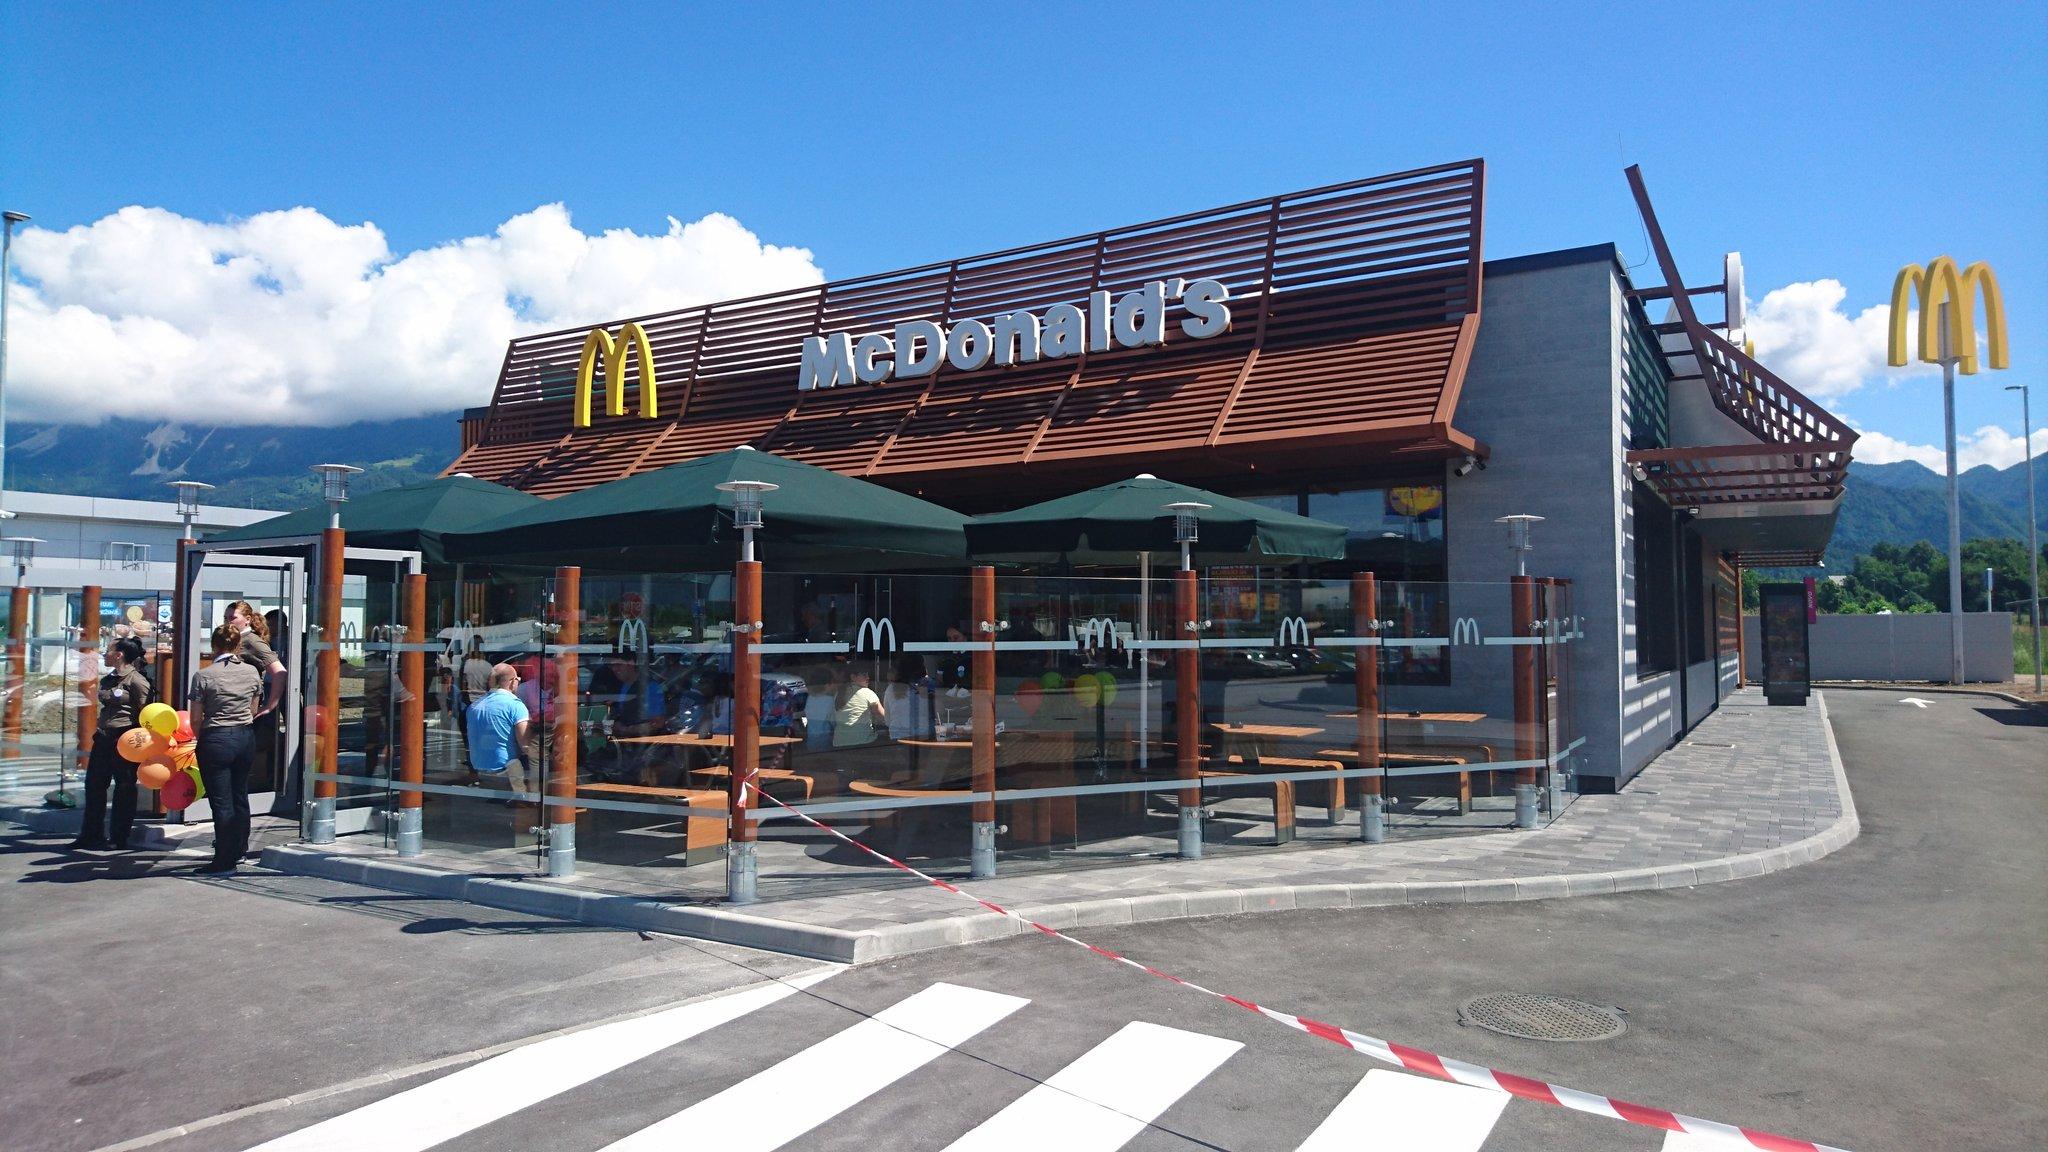 Mcdonalds Lesce Slovenia